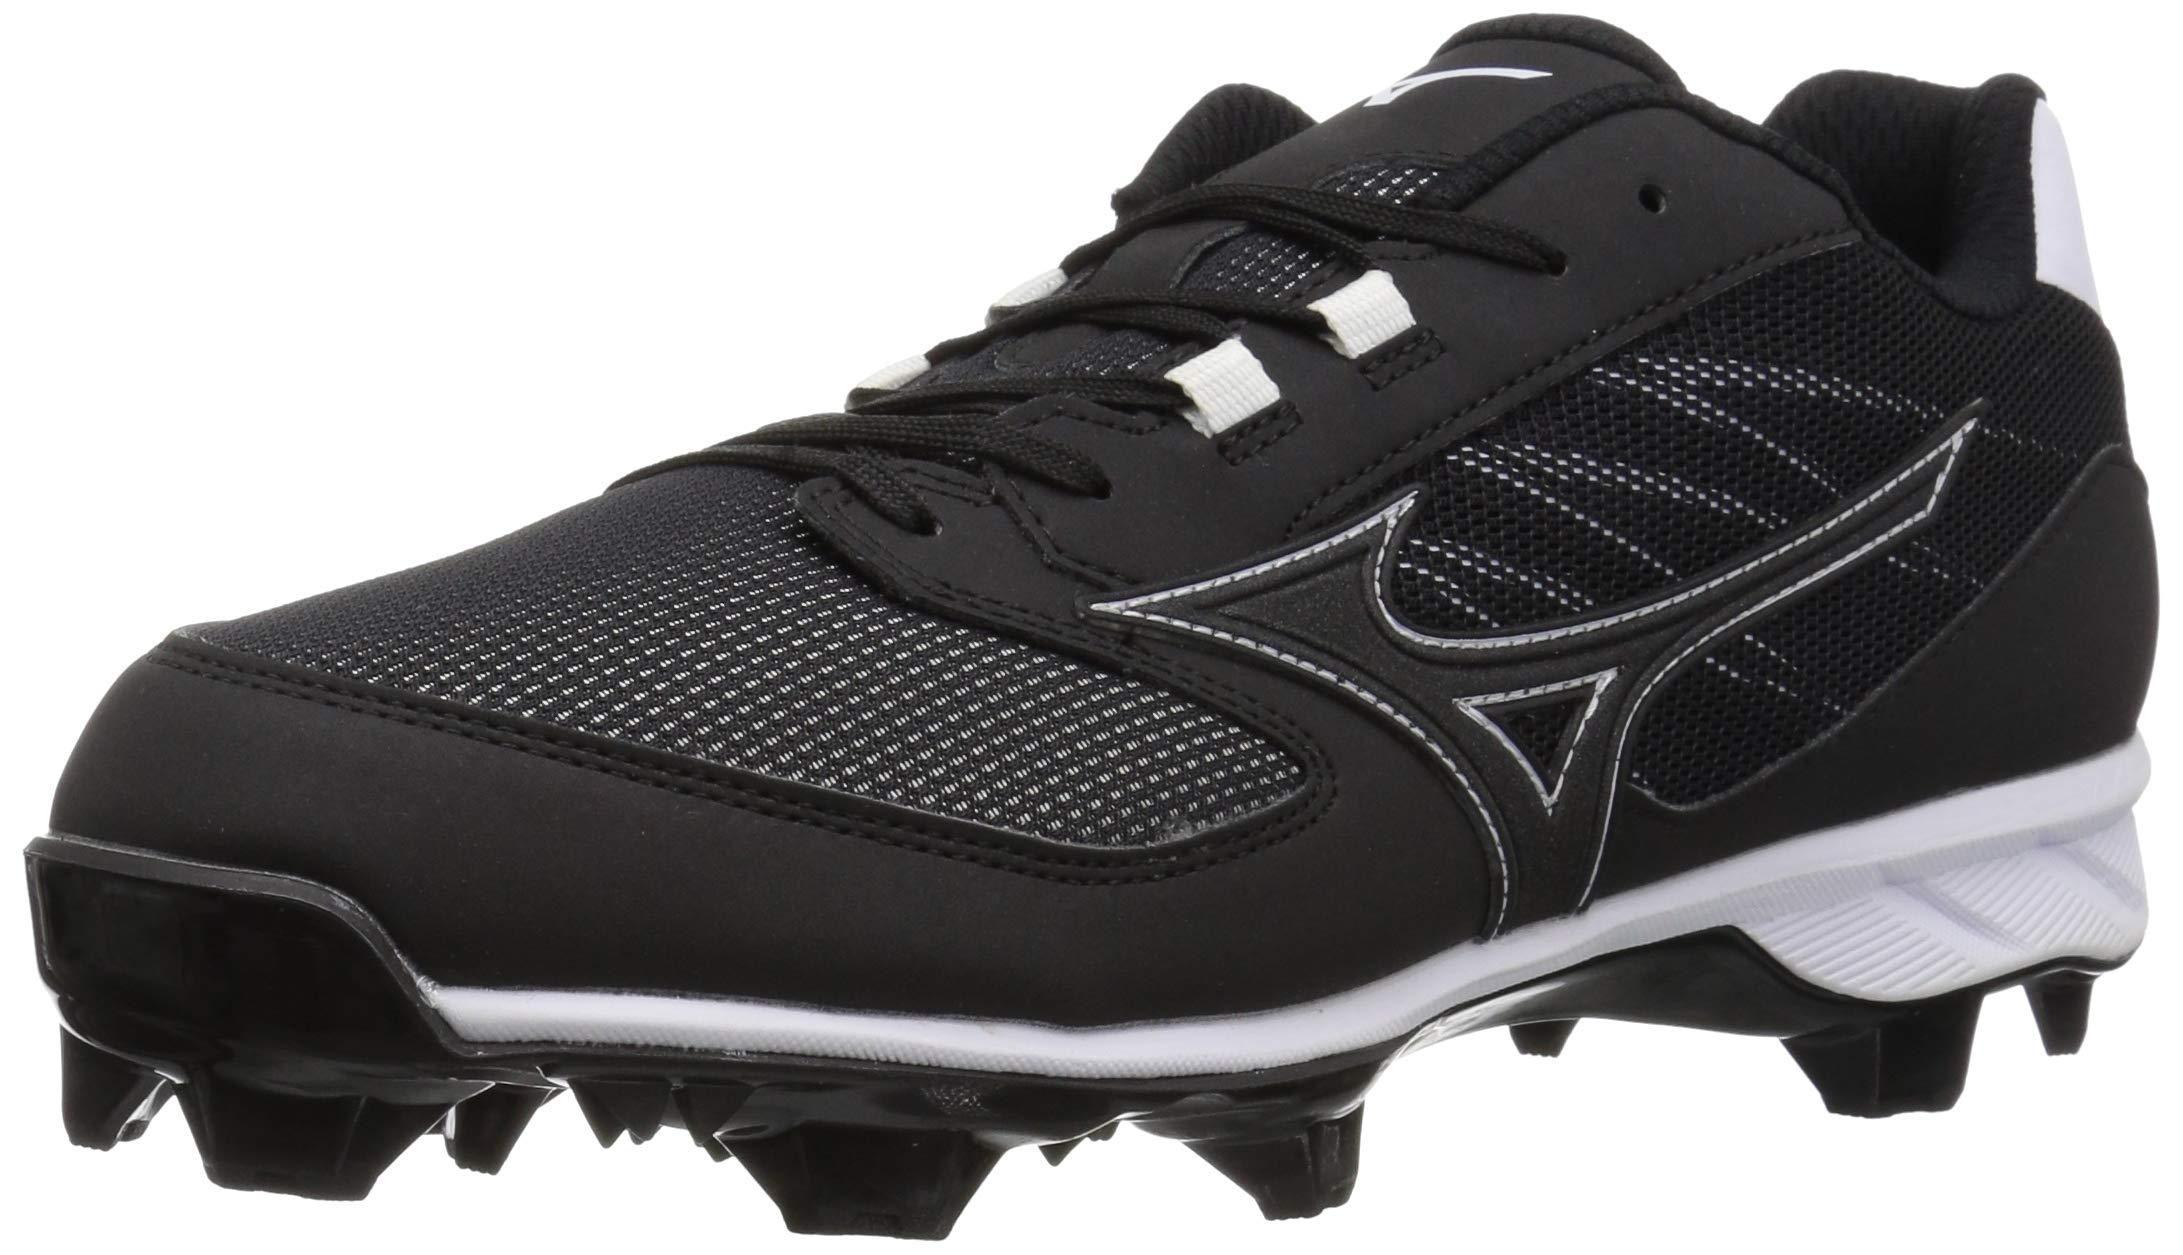 Mizuno Men's 9-Spike Advanced Dominant TPU Molded Baseball Cleat Shoe, Black/White, 6 D US